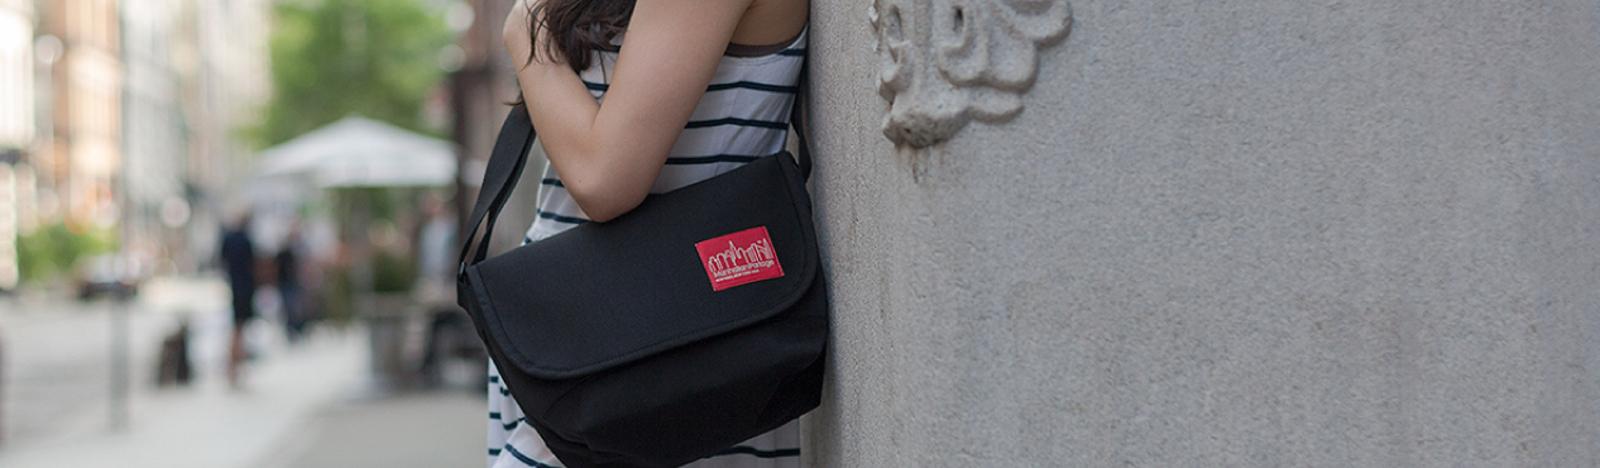 106dcc625b Manhattan Portage Token Bags